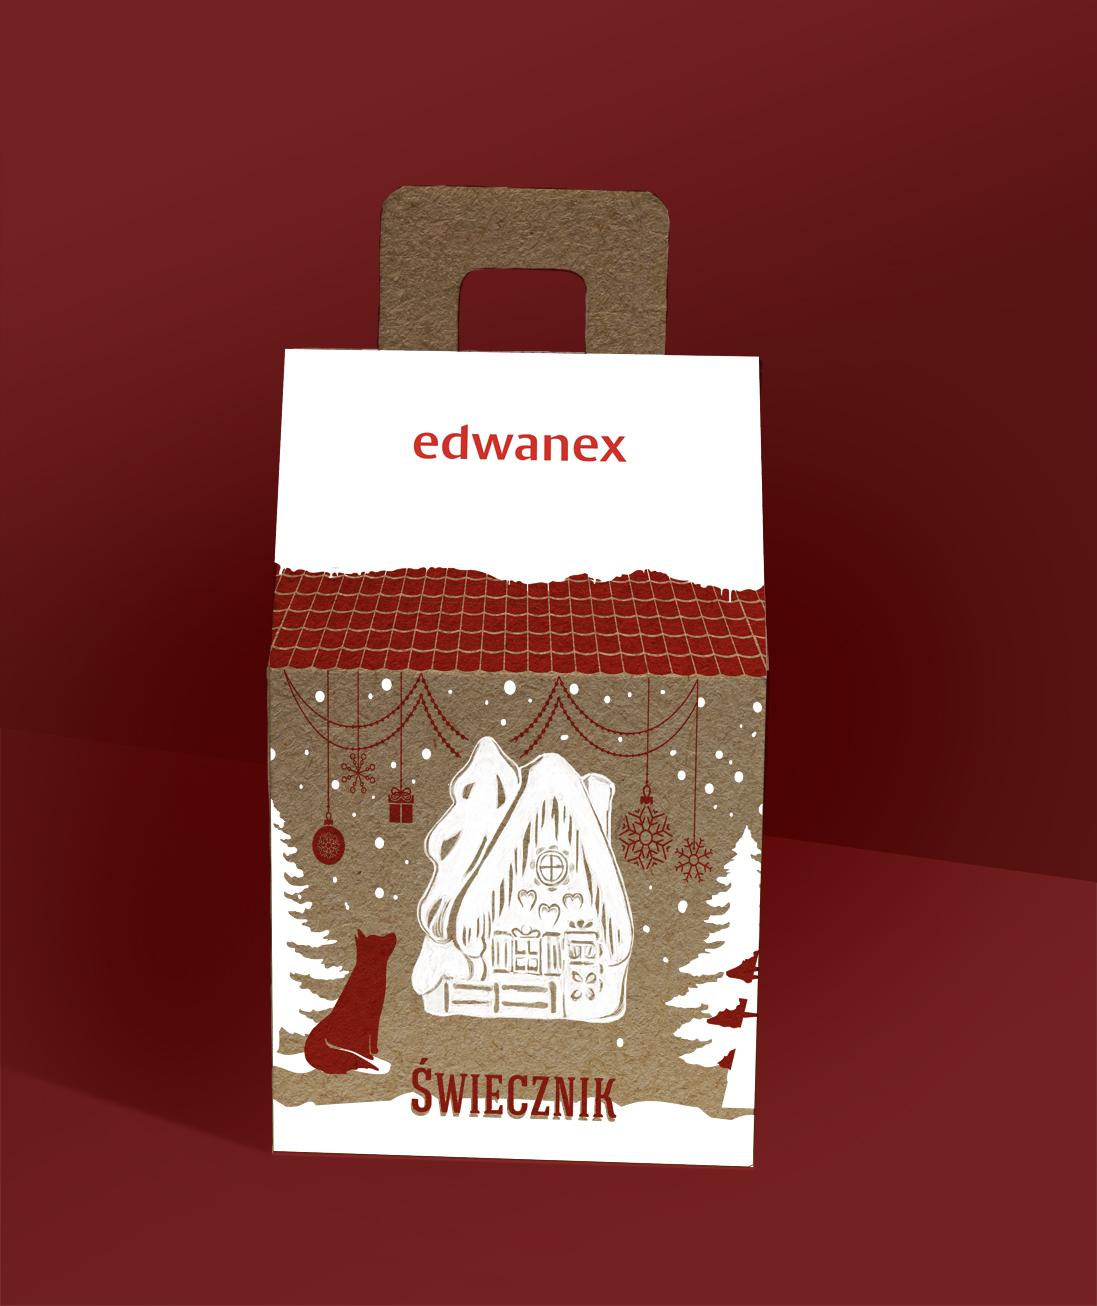 edwanex-pudelko